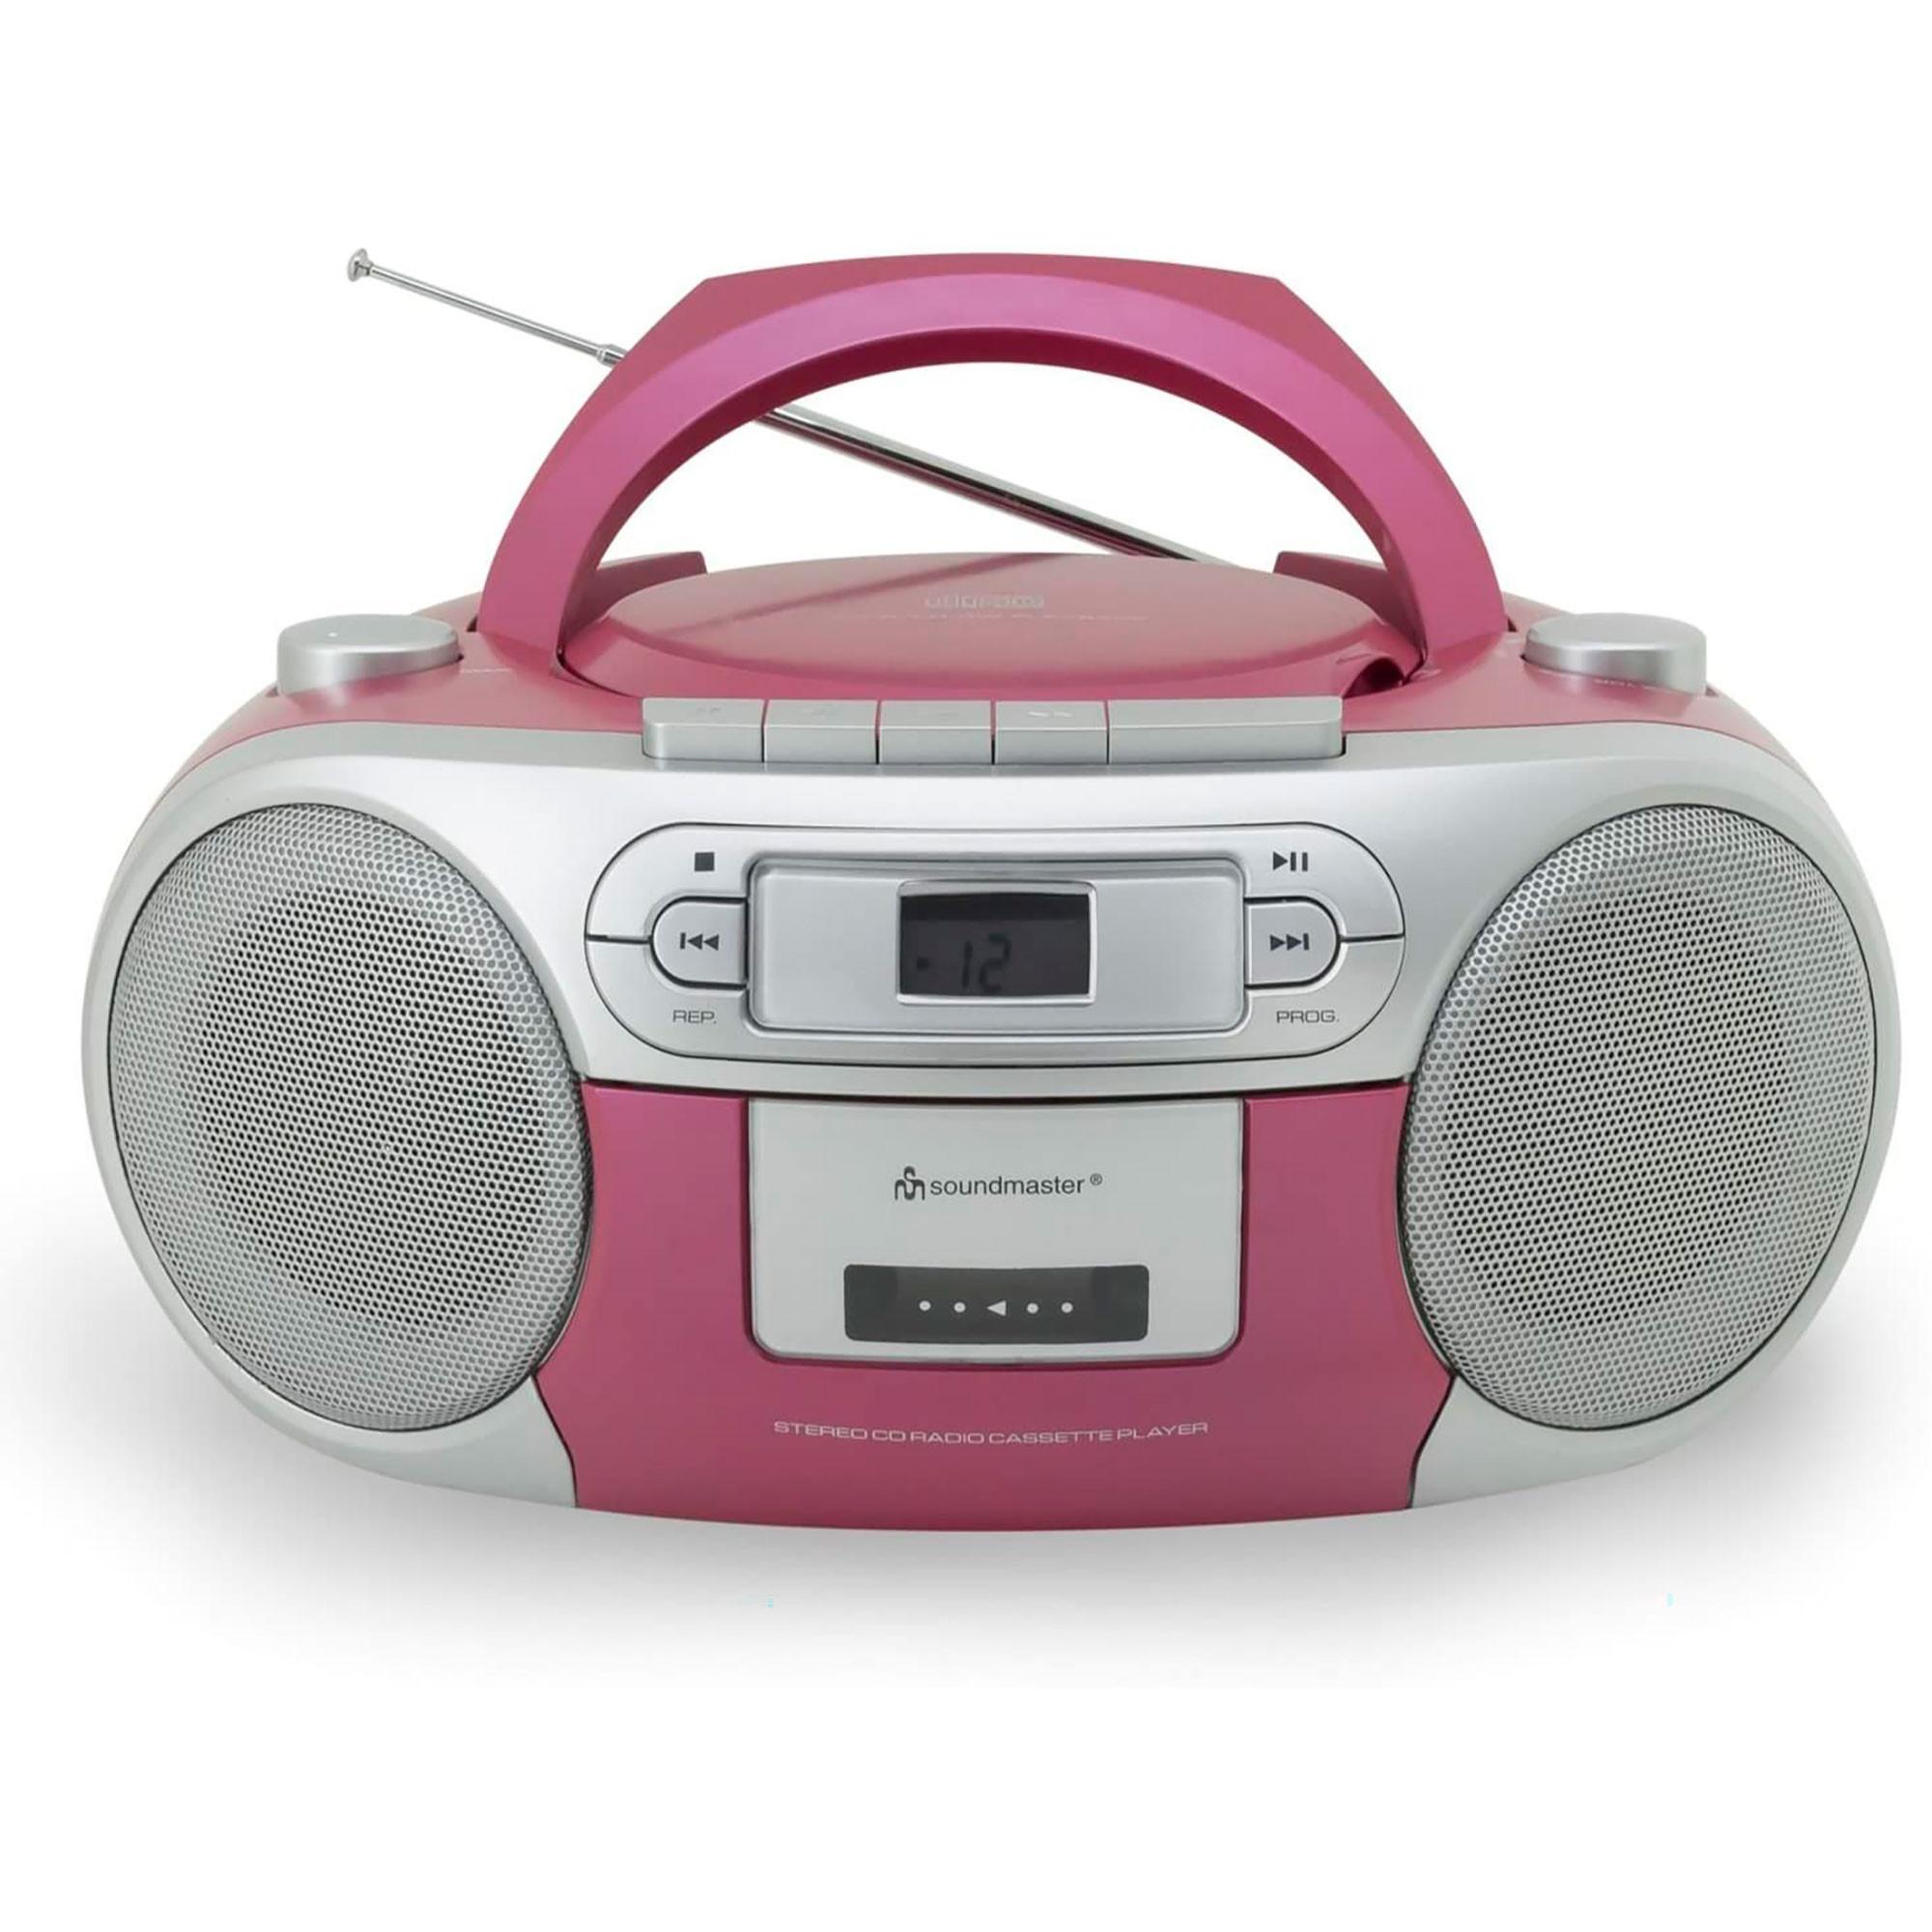 Soundmaster SCD5410PI Boombox Radio AM/FM Analógica, Reproductor CD, Cassette, Portátil, Rosa